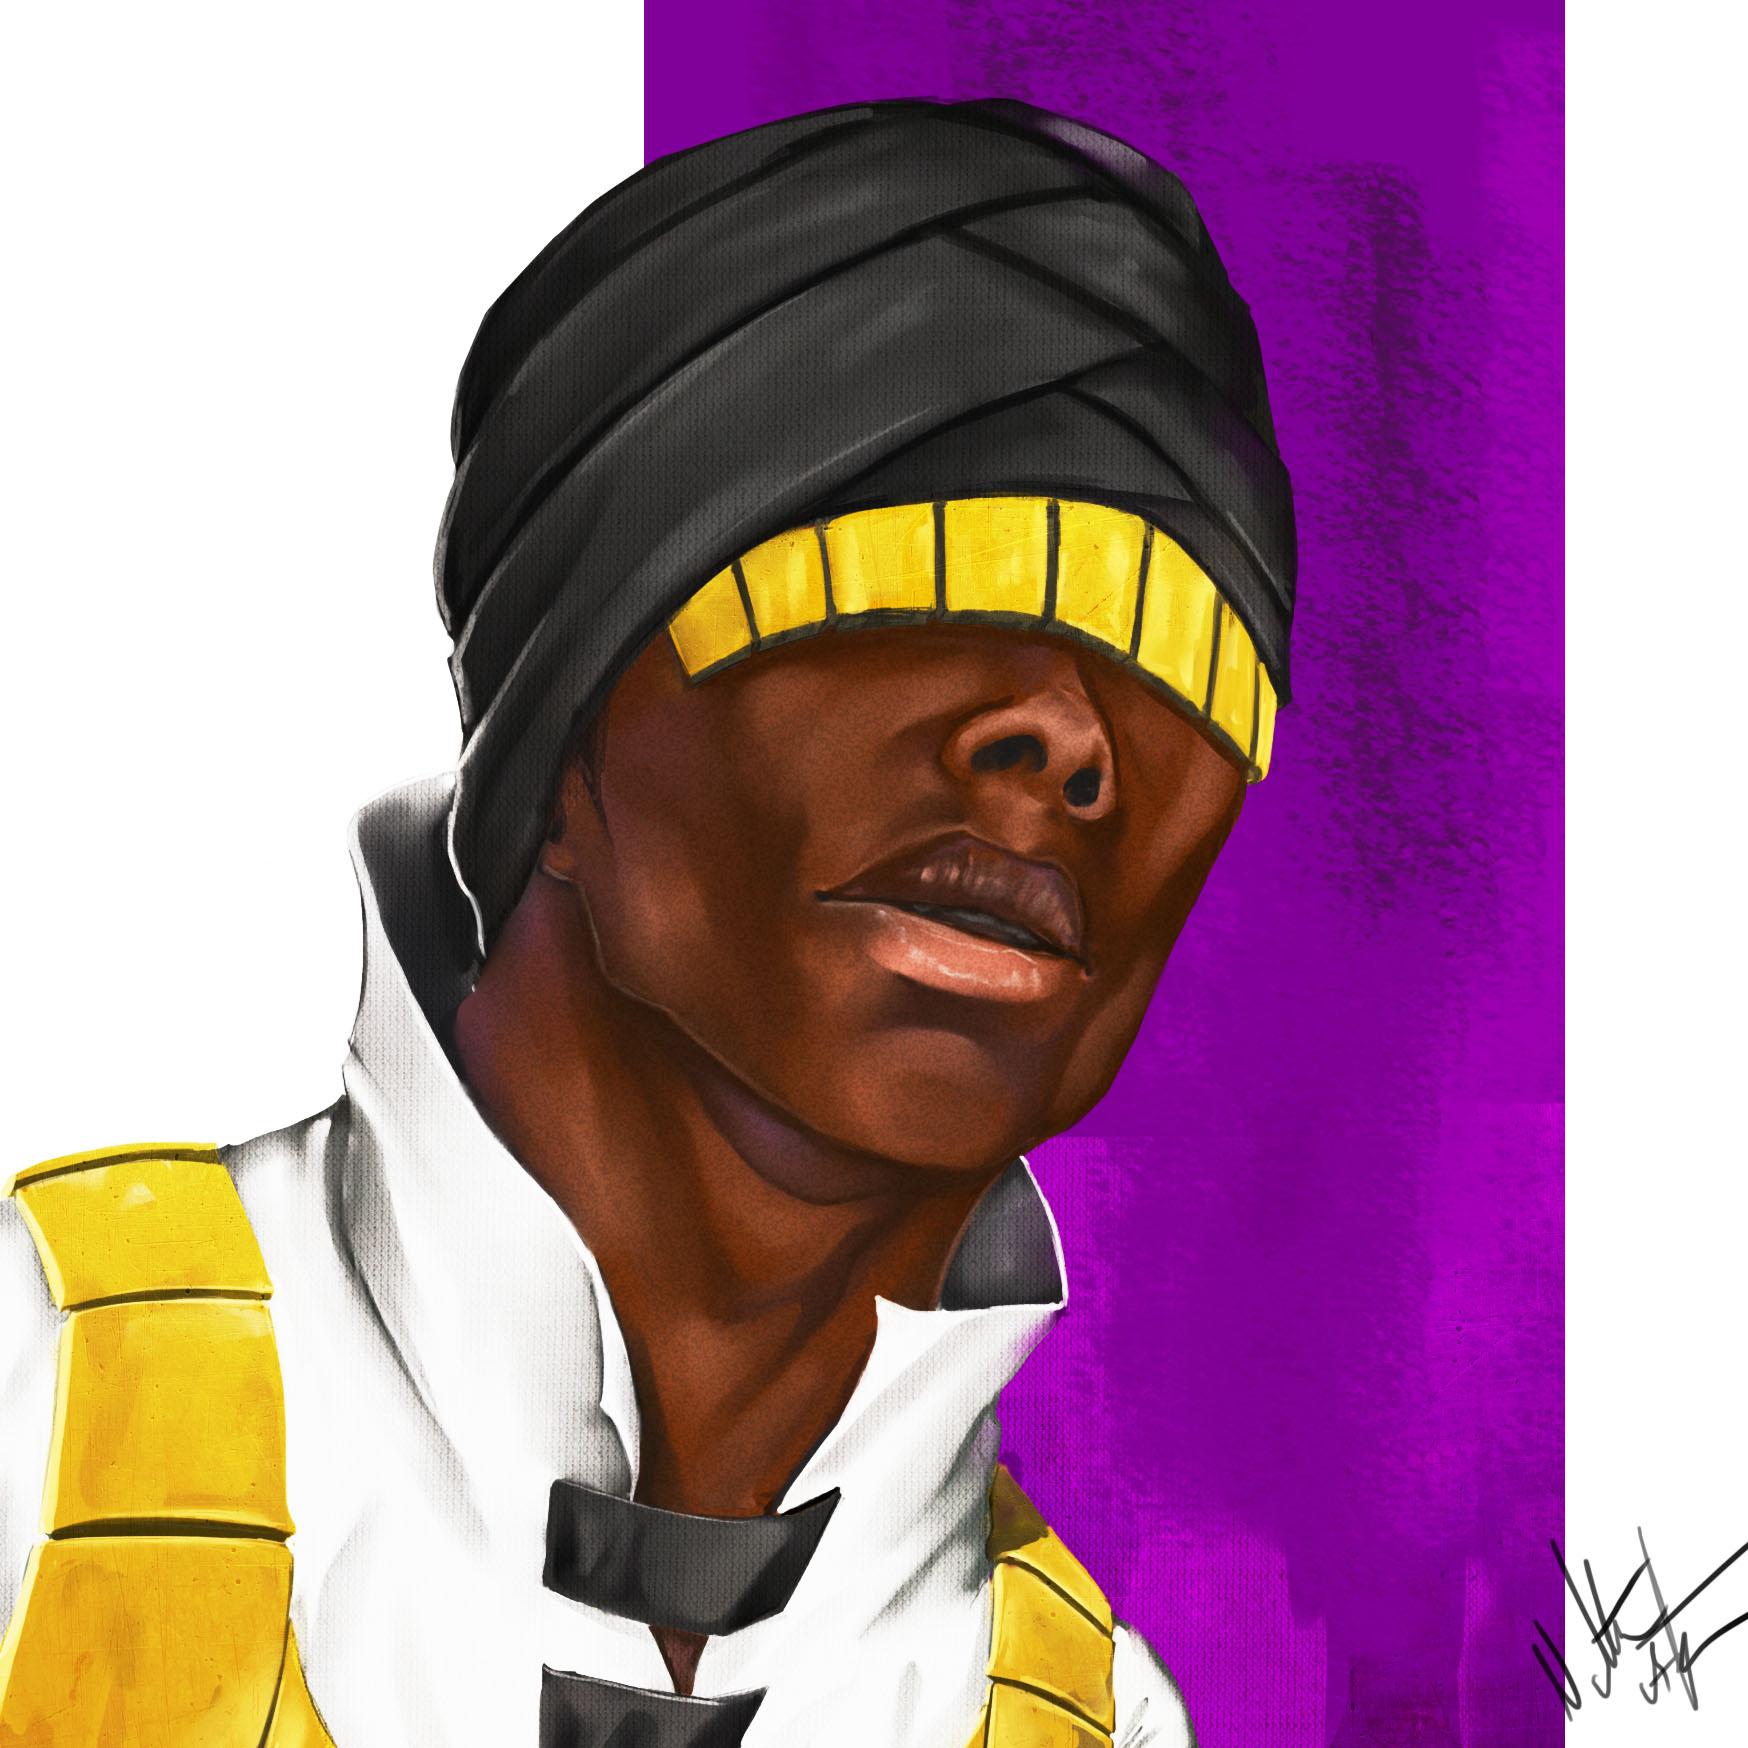 commander black mod